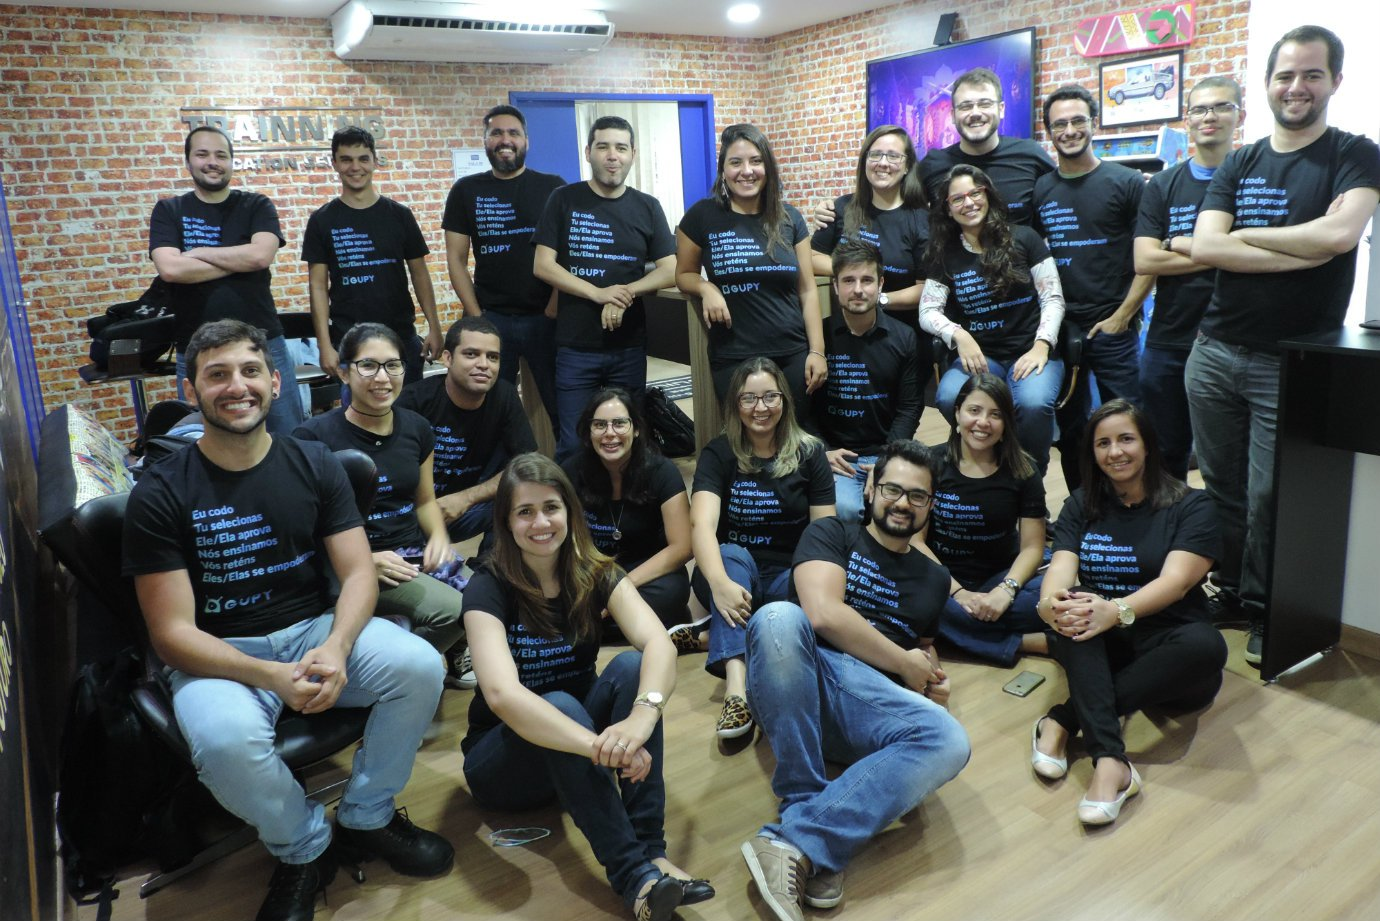 <span>A equipe da startup Gupy</span>